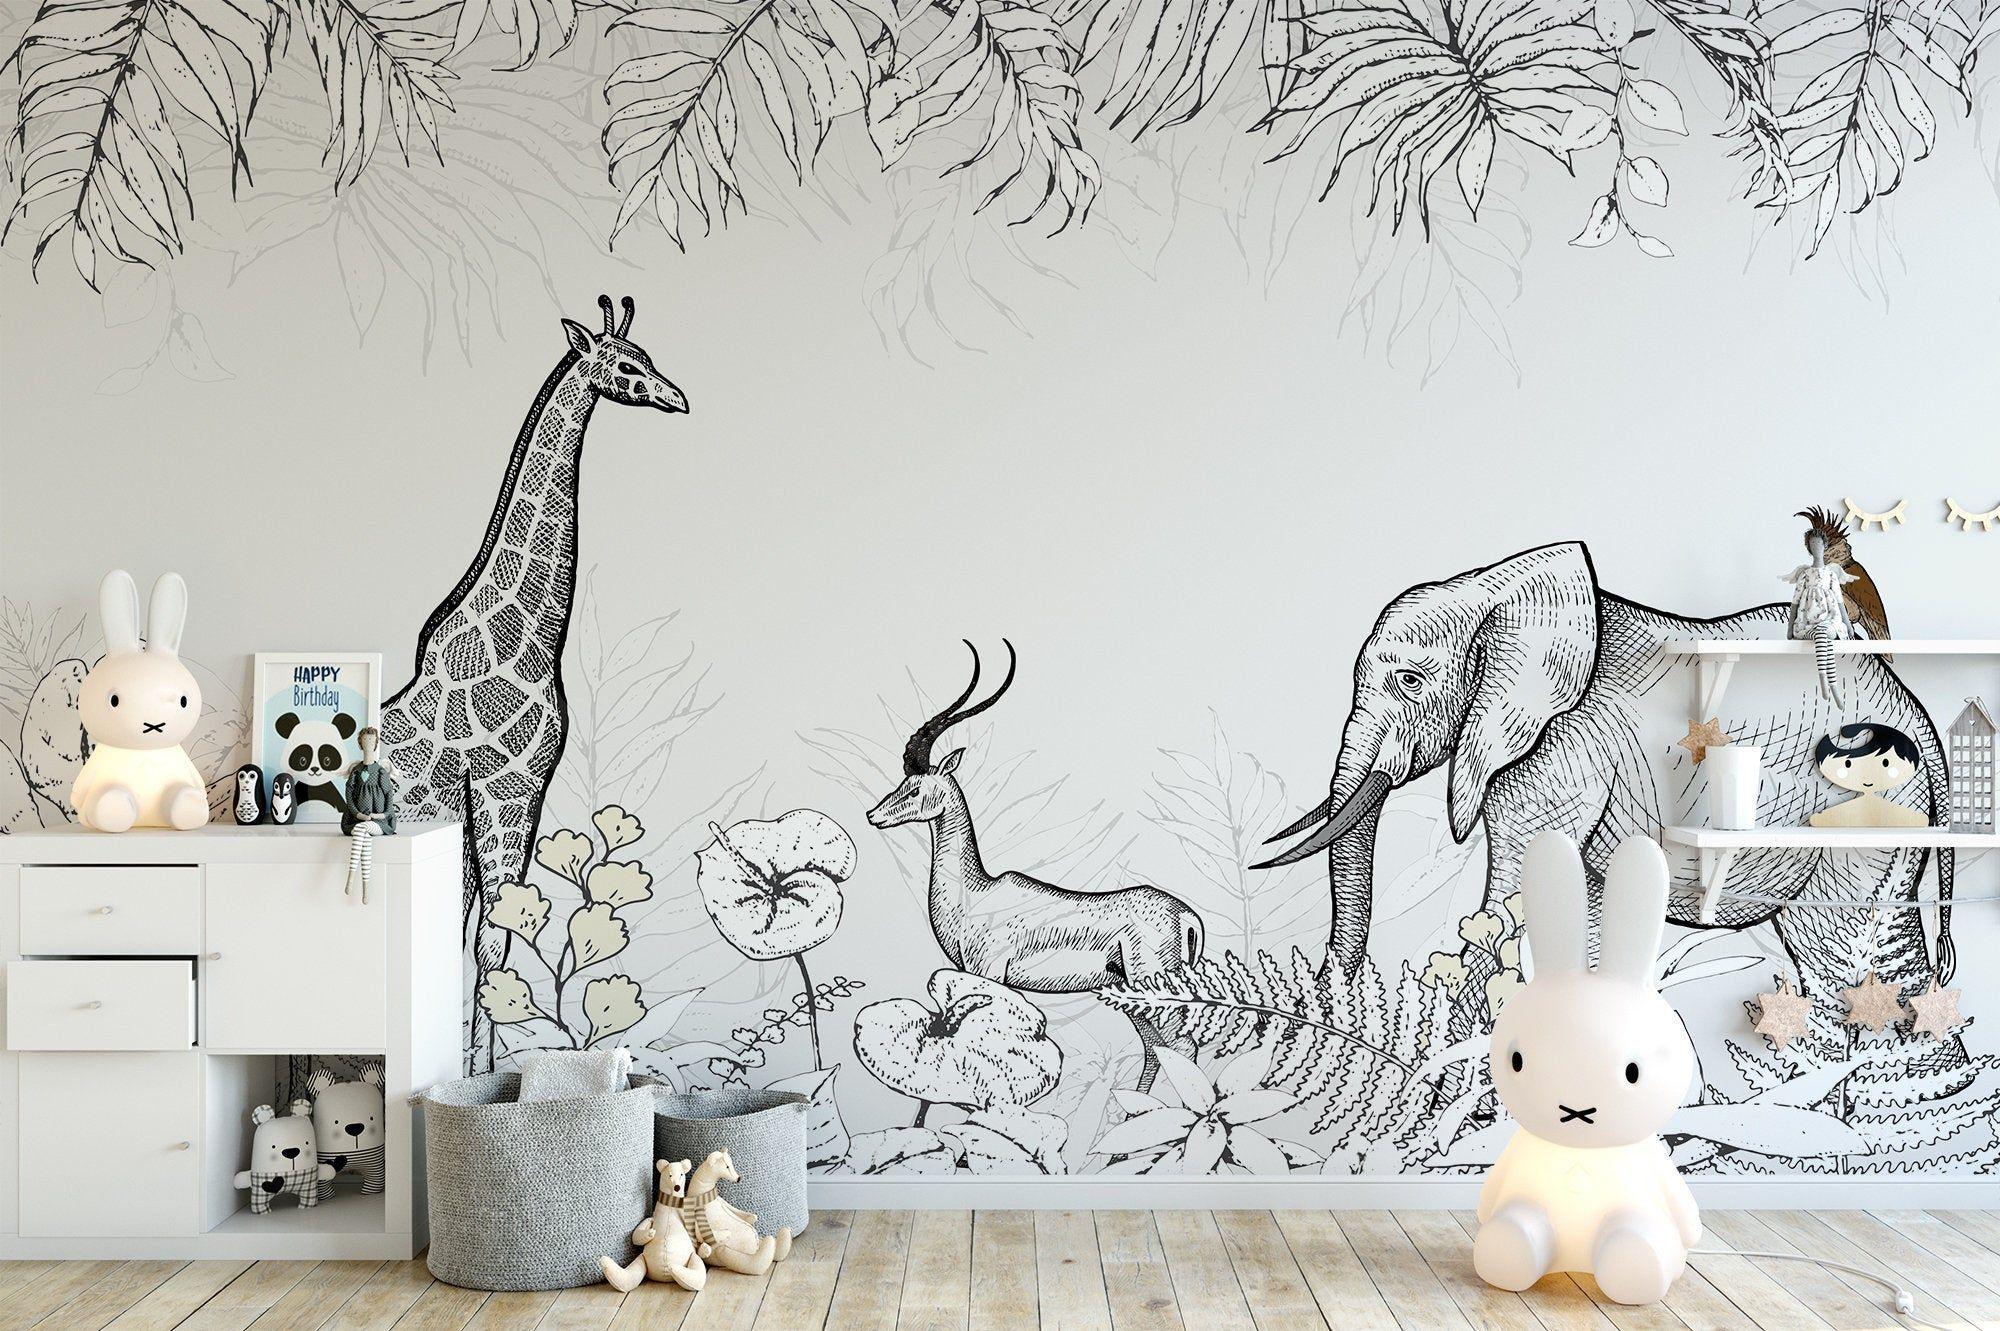 White Black Animals Giraffe Elephant Drawing Tropical Jungle Etsy Kids Room Wallpaper Room Wallpaper Jungle Wallpaper